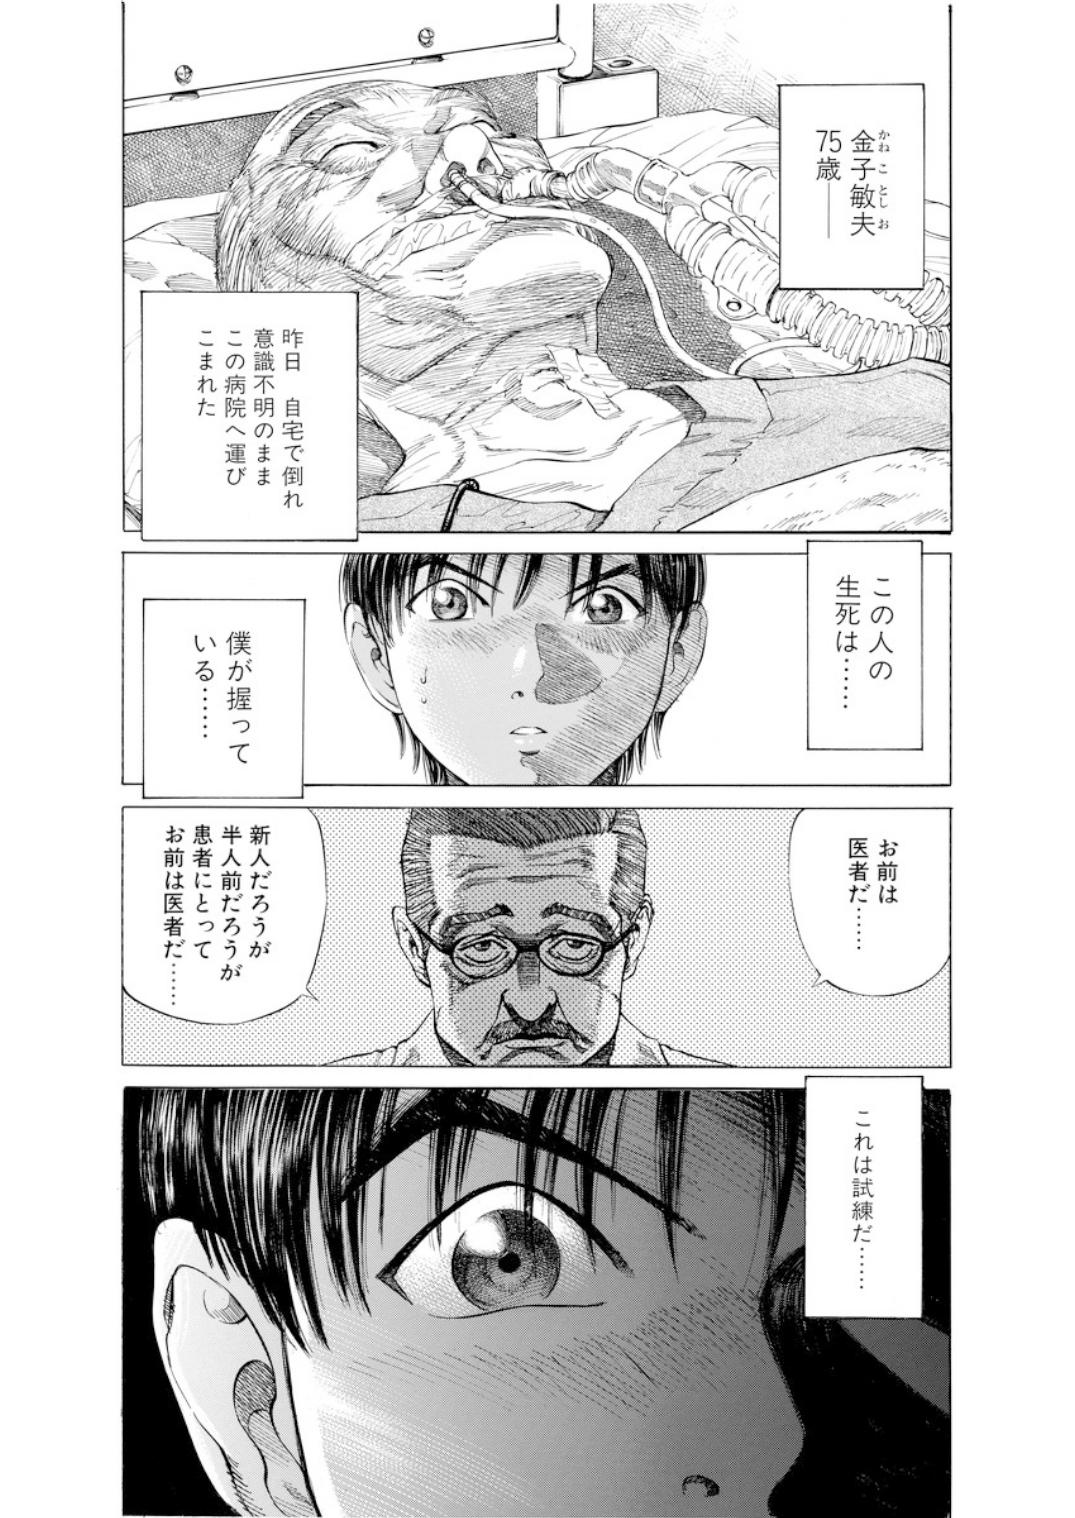 001bj_page-0083.jpg